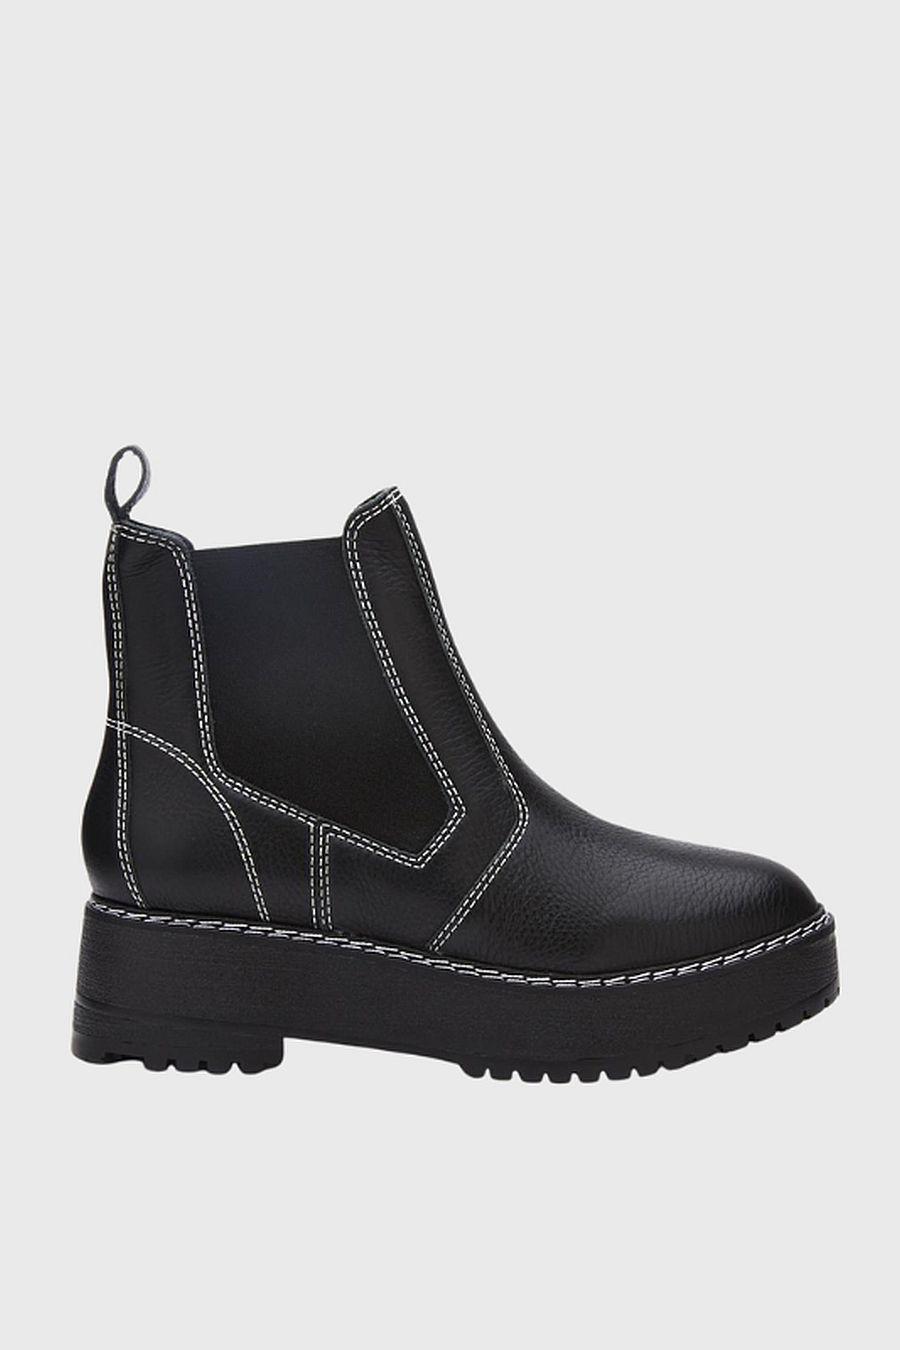 Matisse Footwear Mason Chelsea Boot - black